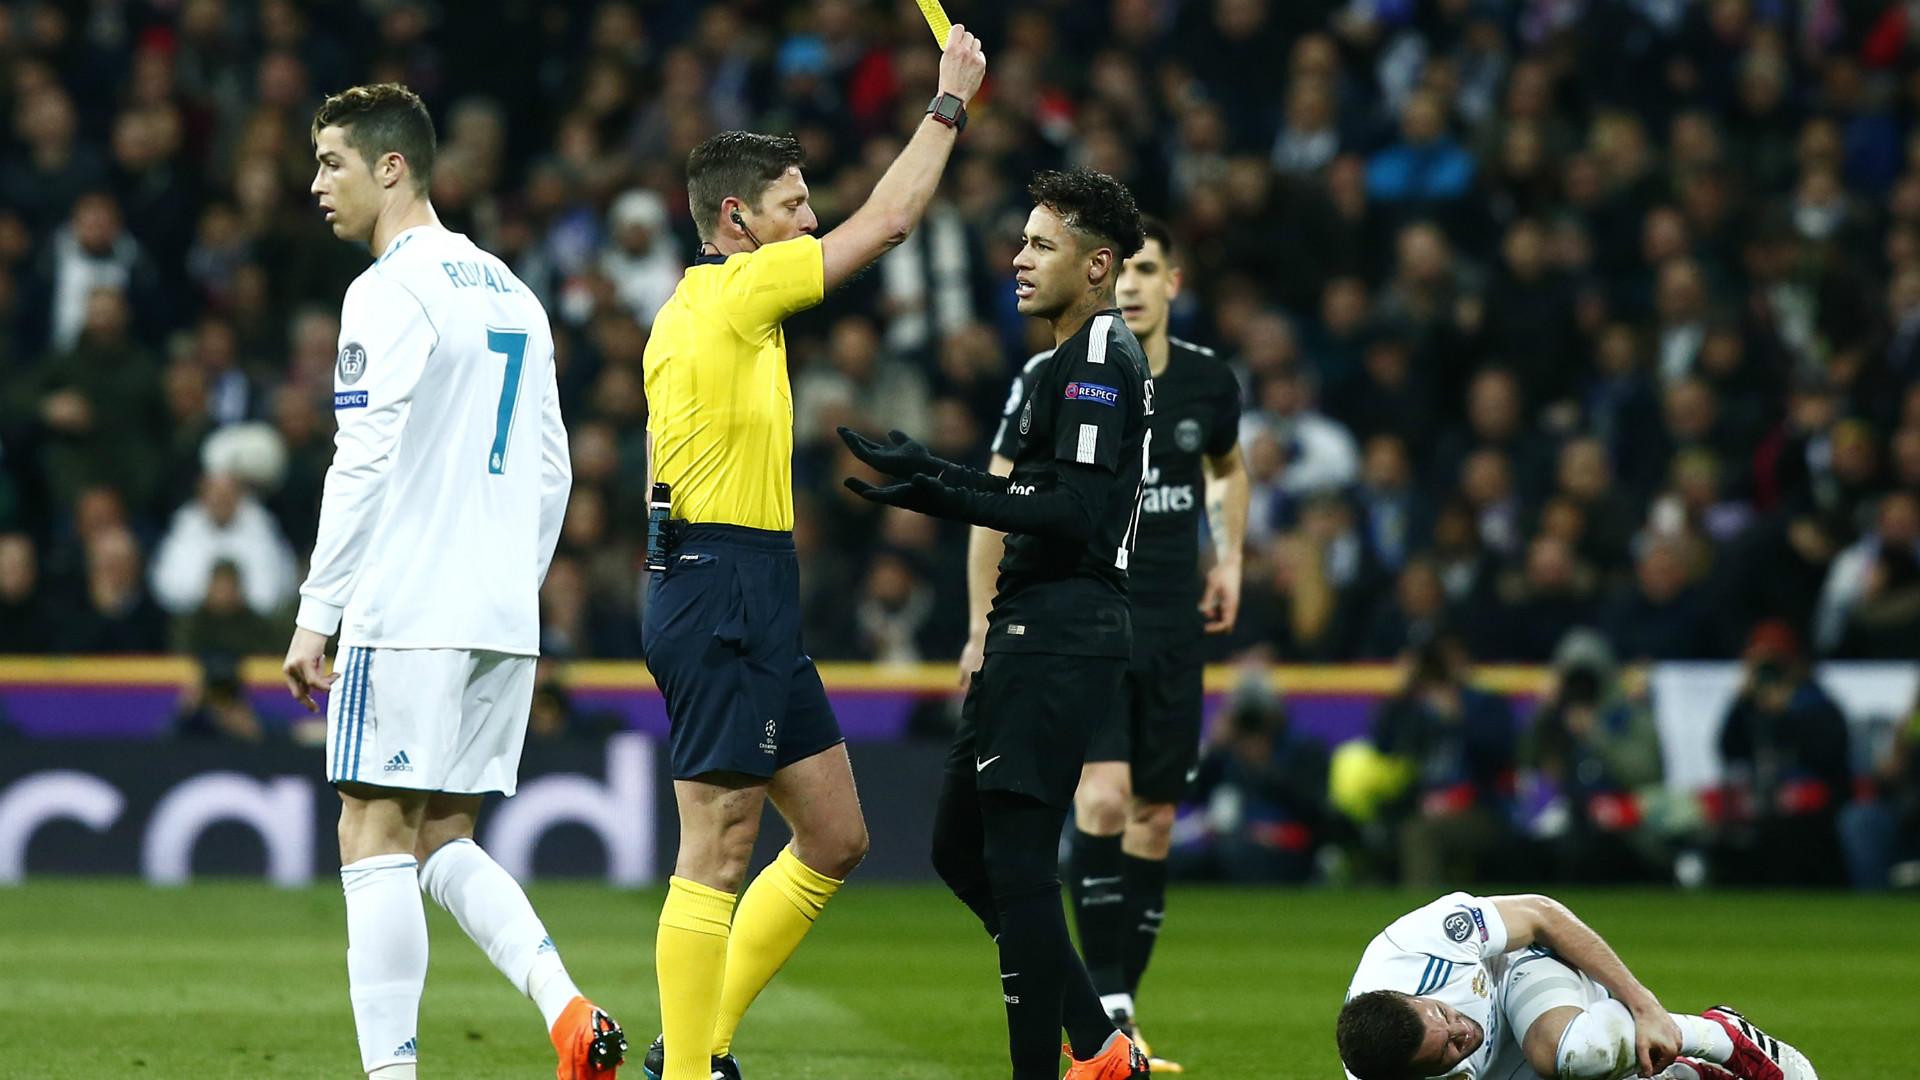 Real Madrid Vs Psg Ao Vivo